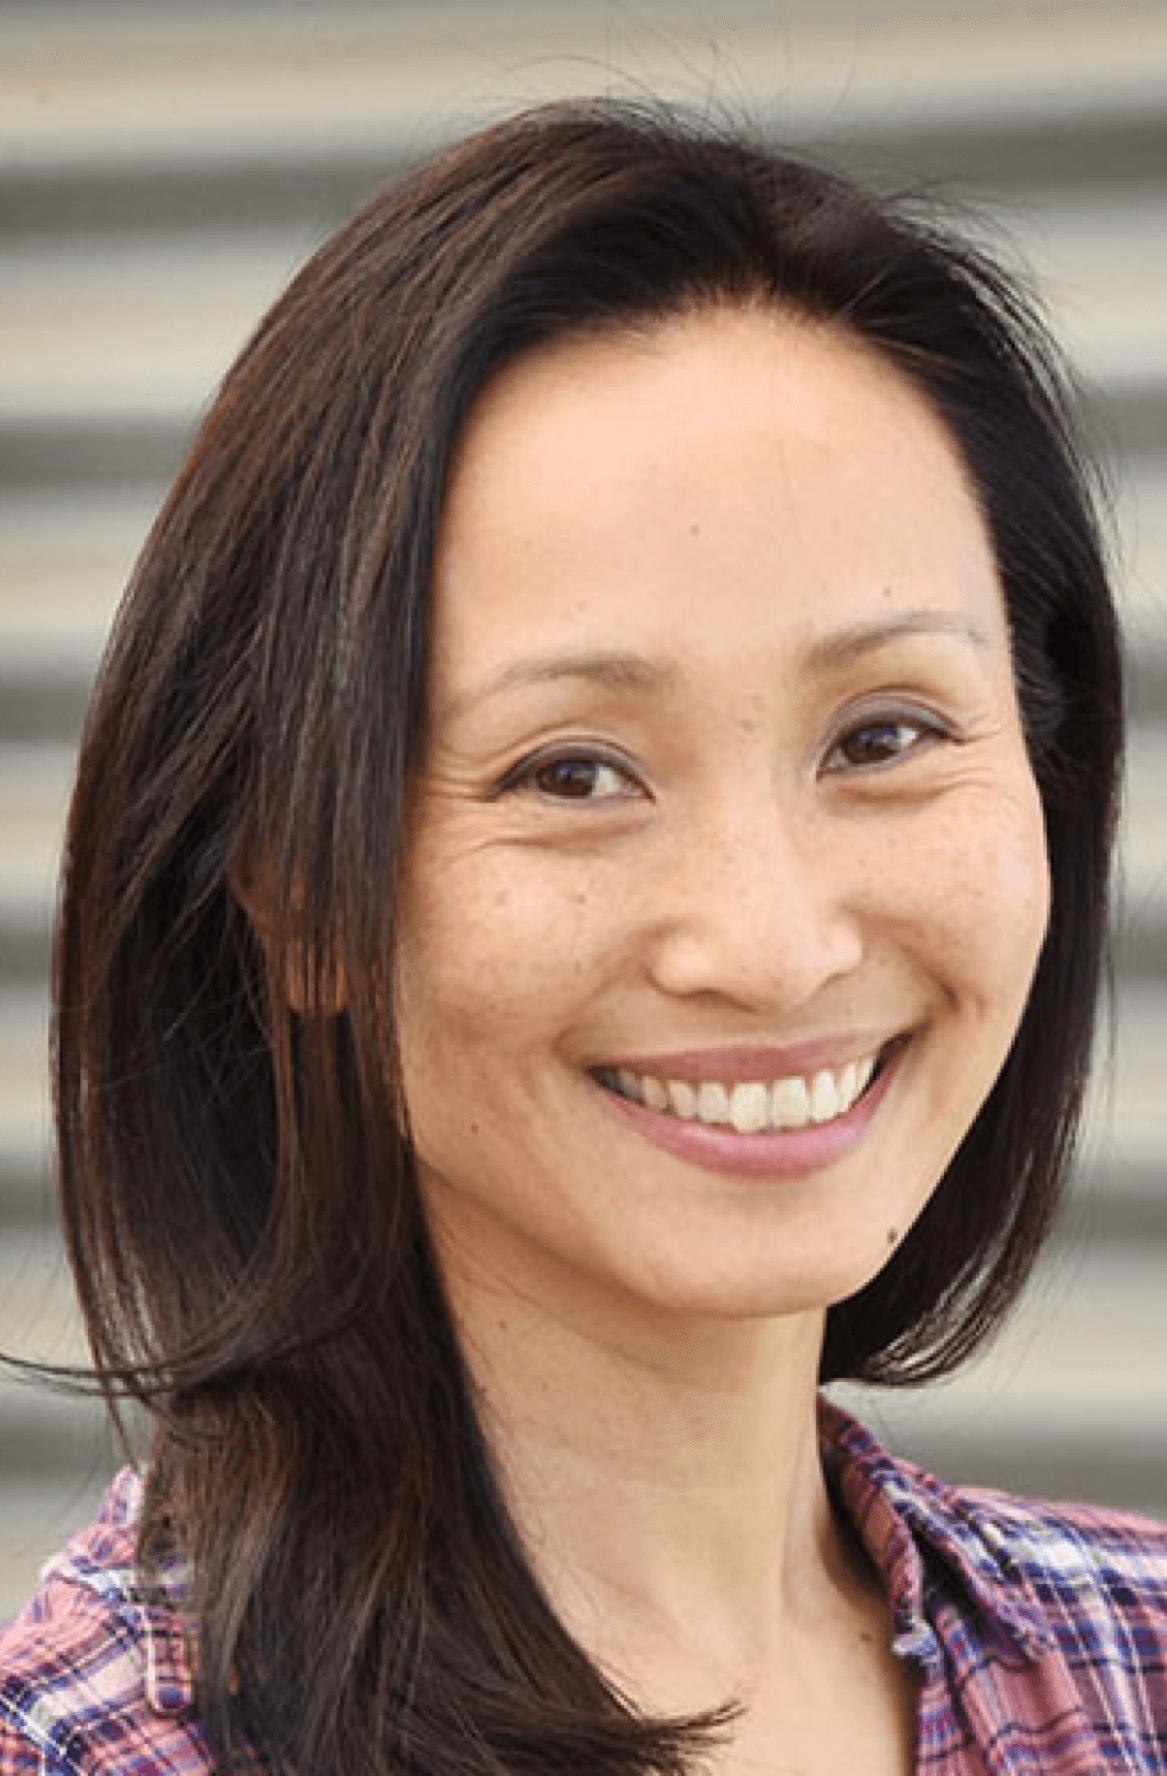 Headshot of Diana Ngo, Director of Finance at YourMechanic